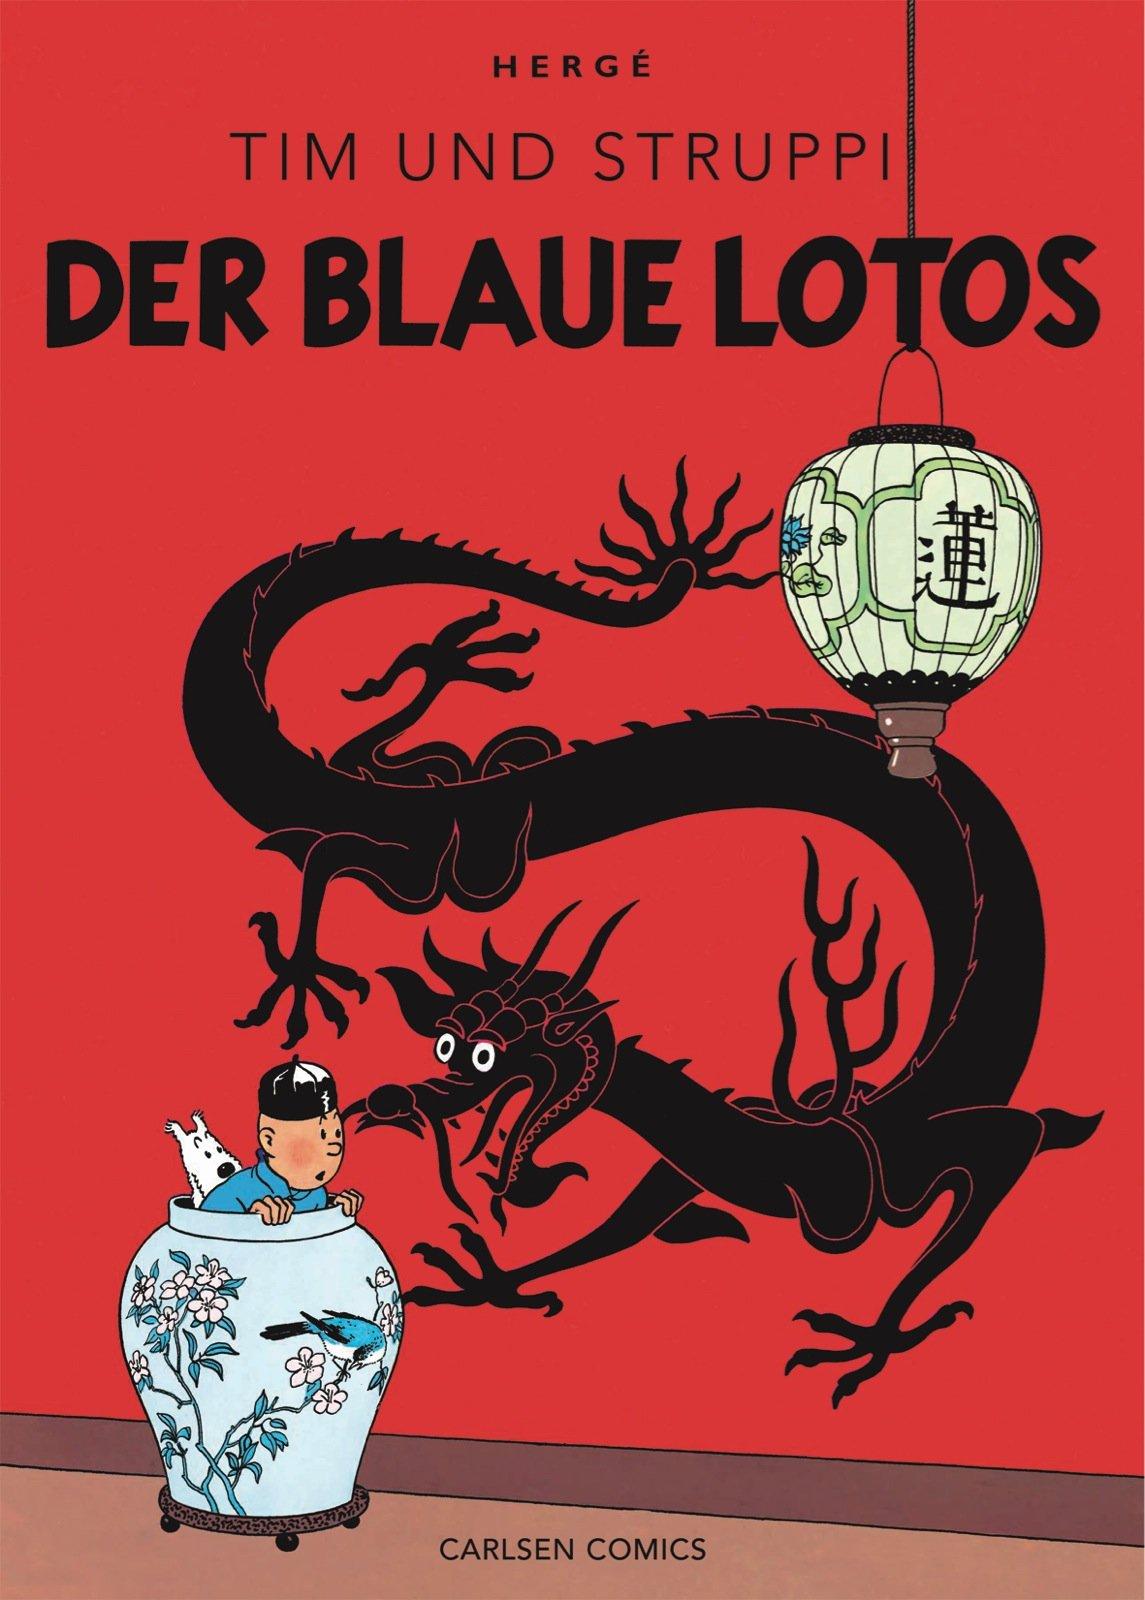 Tim & Struppi Farbfaksimile, Band 4: Der blaue Lotos